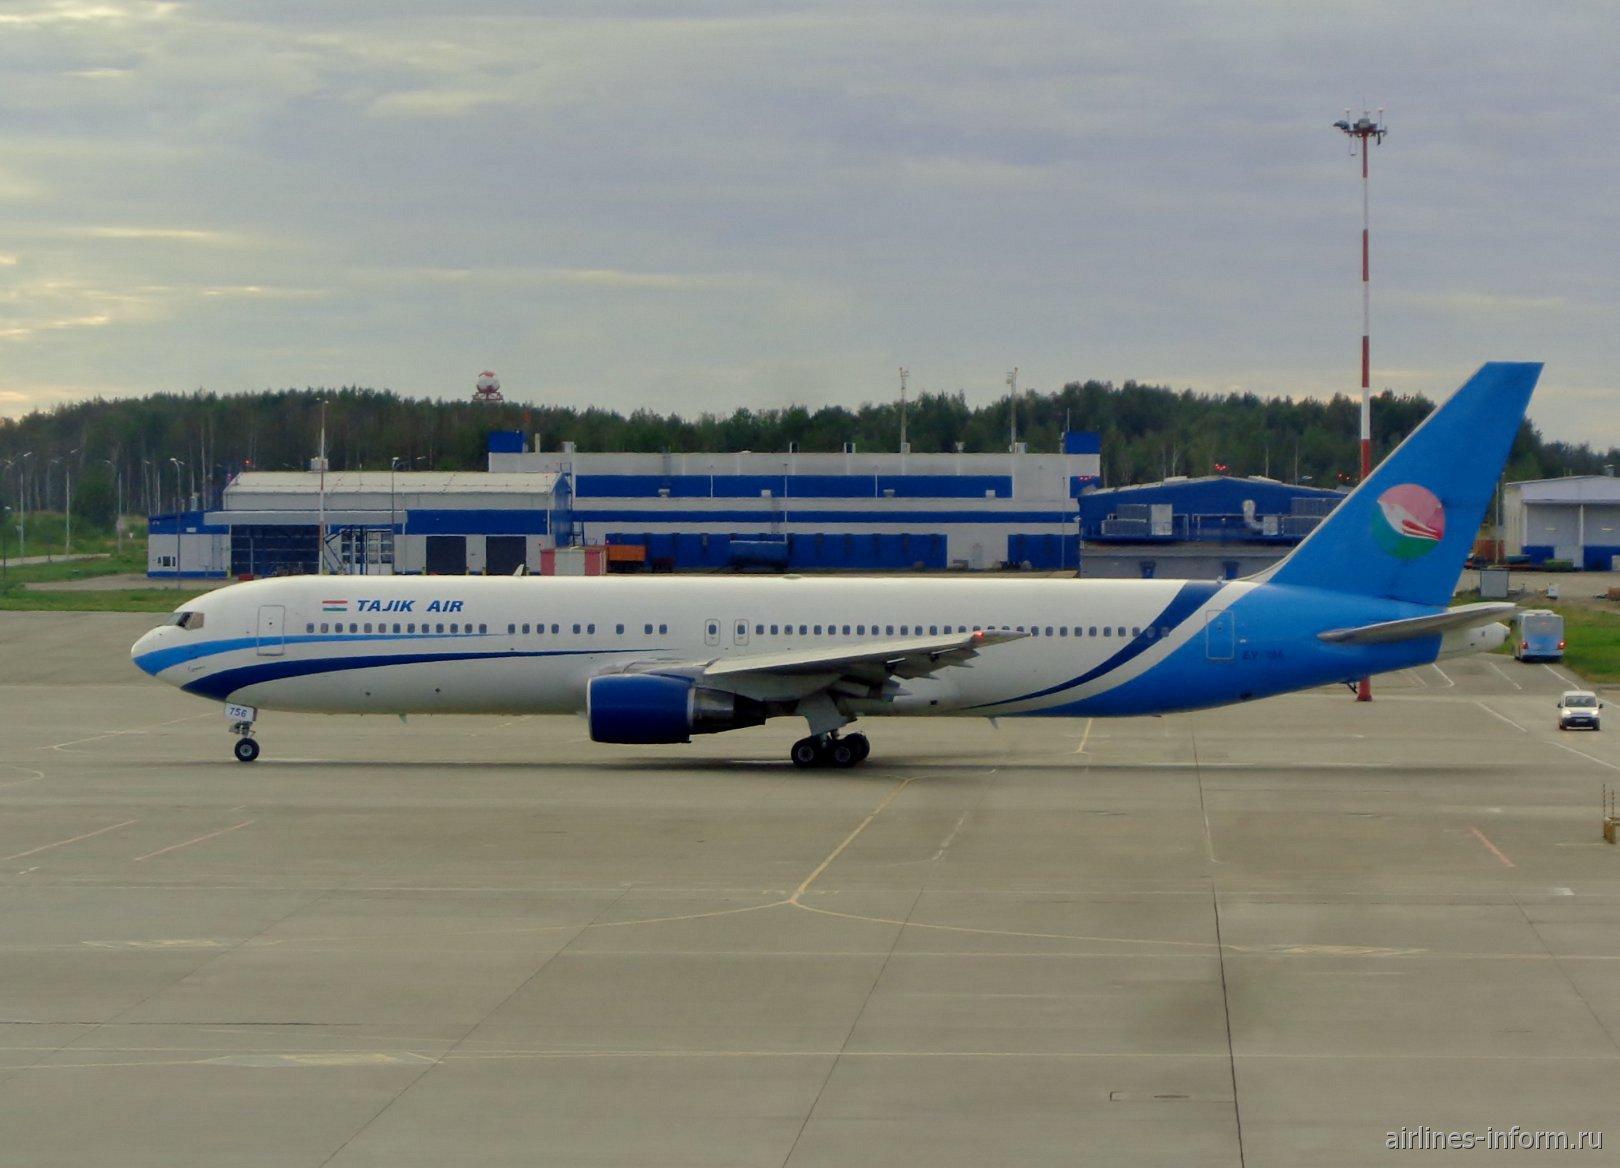 Самолет Боинг-767-300 авиакомпании Tajik Ar в аэропорту Пулково